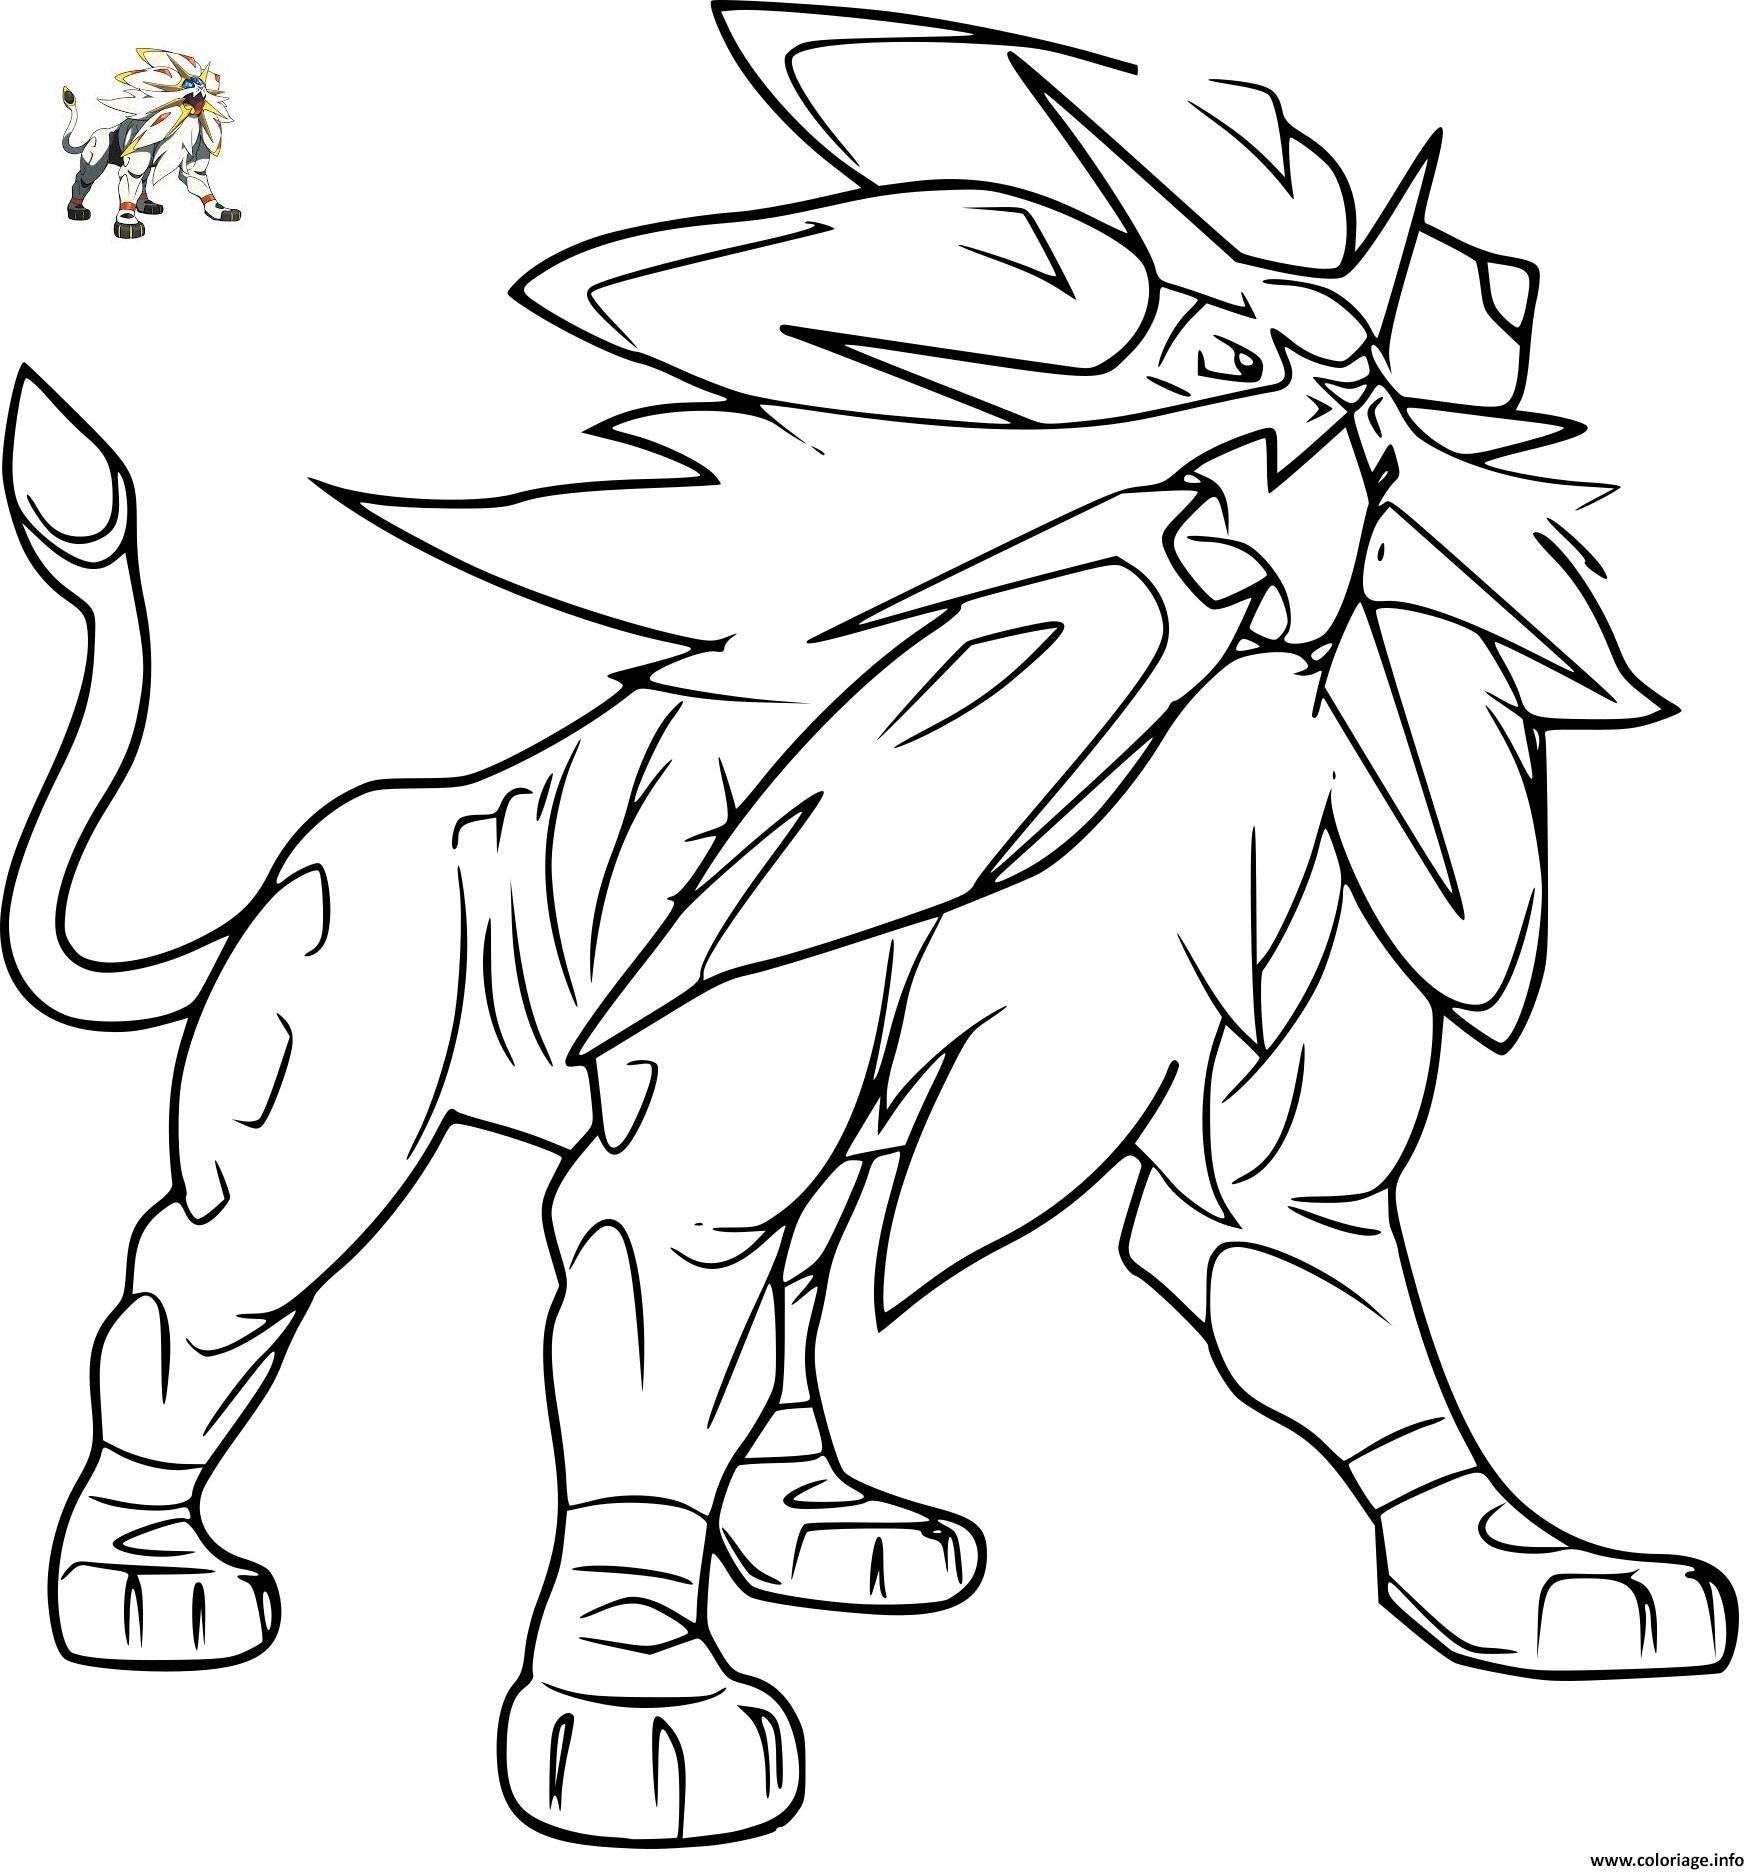 Coloriage Pokemon Solgaleo Gx Jecoloriecom